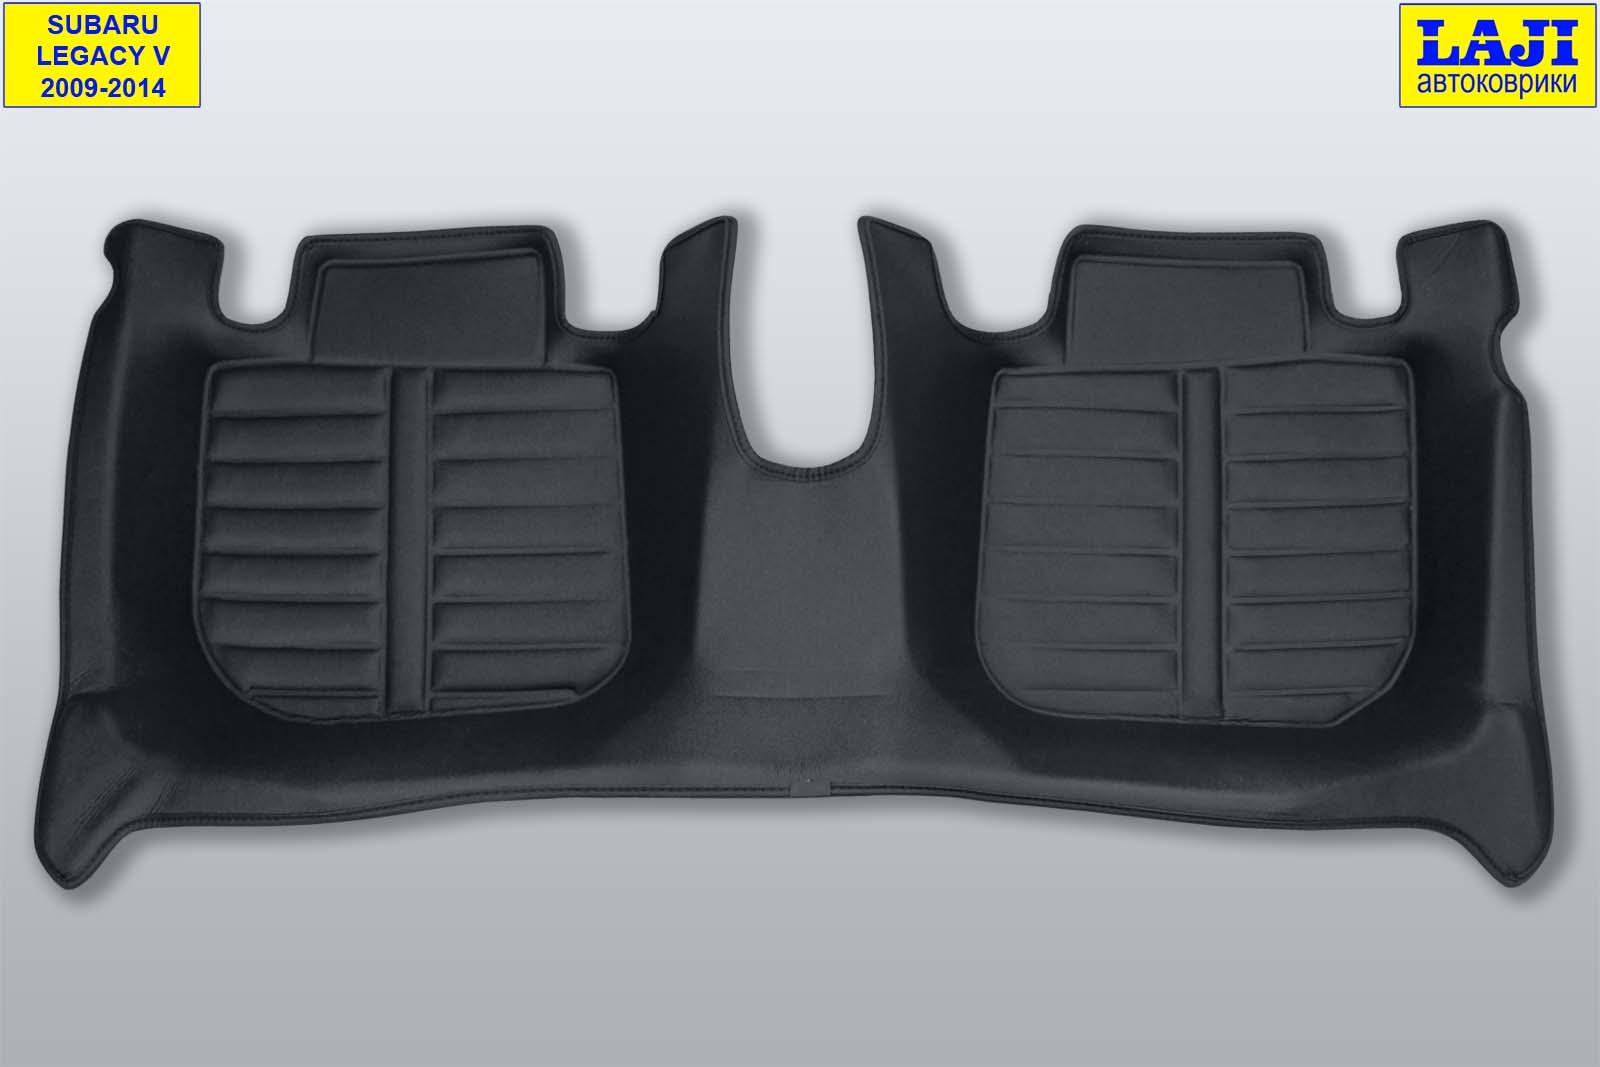 5D коврики в салон Subaru Legacy 5 2009-2014 10